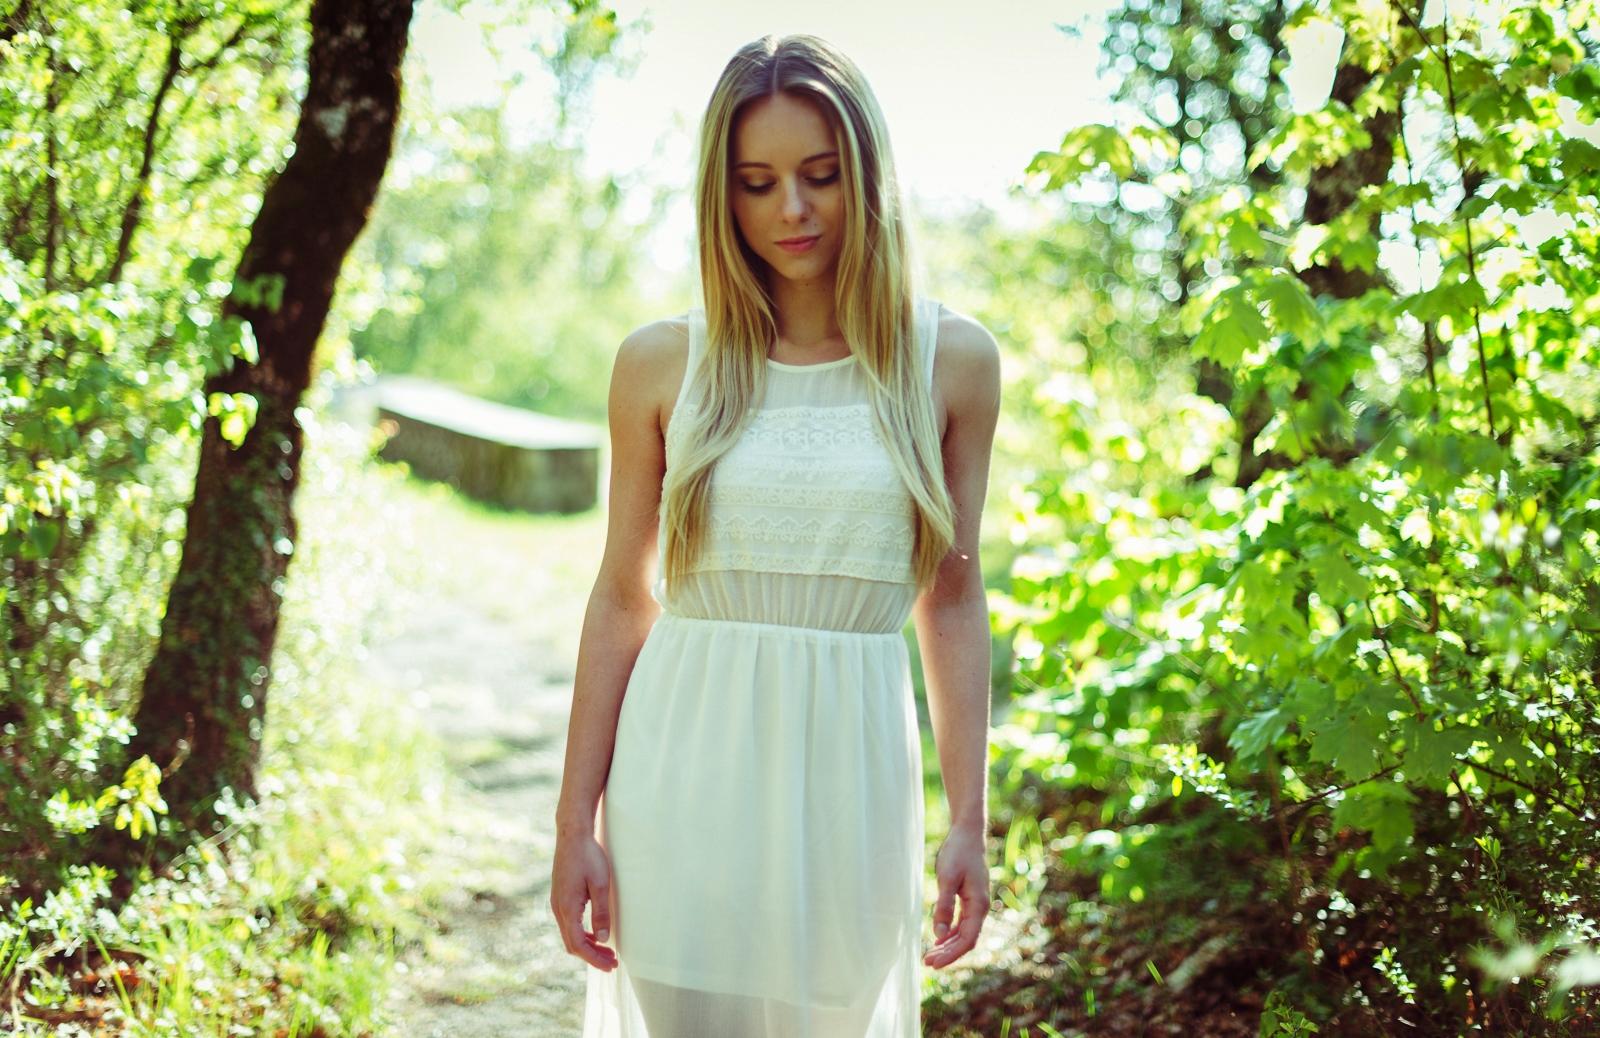 Значение имени Иванна – как влияет на судьбу и характер